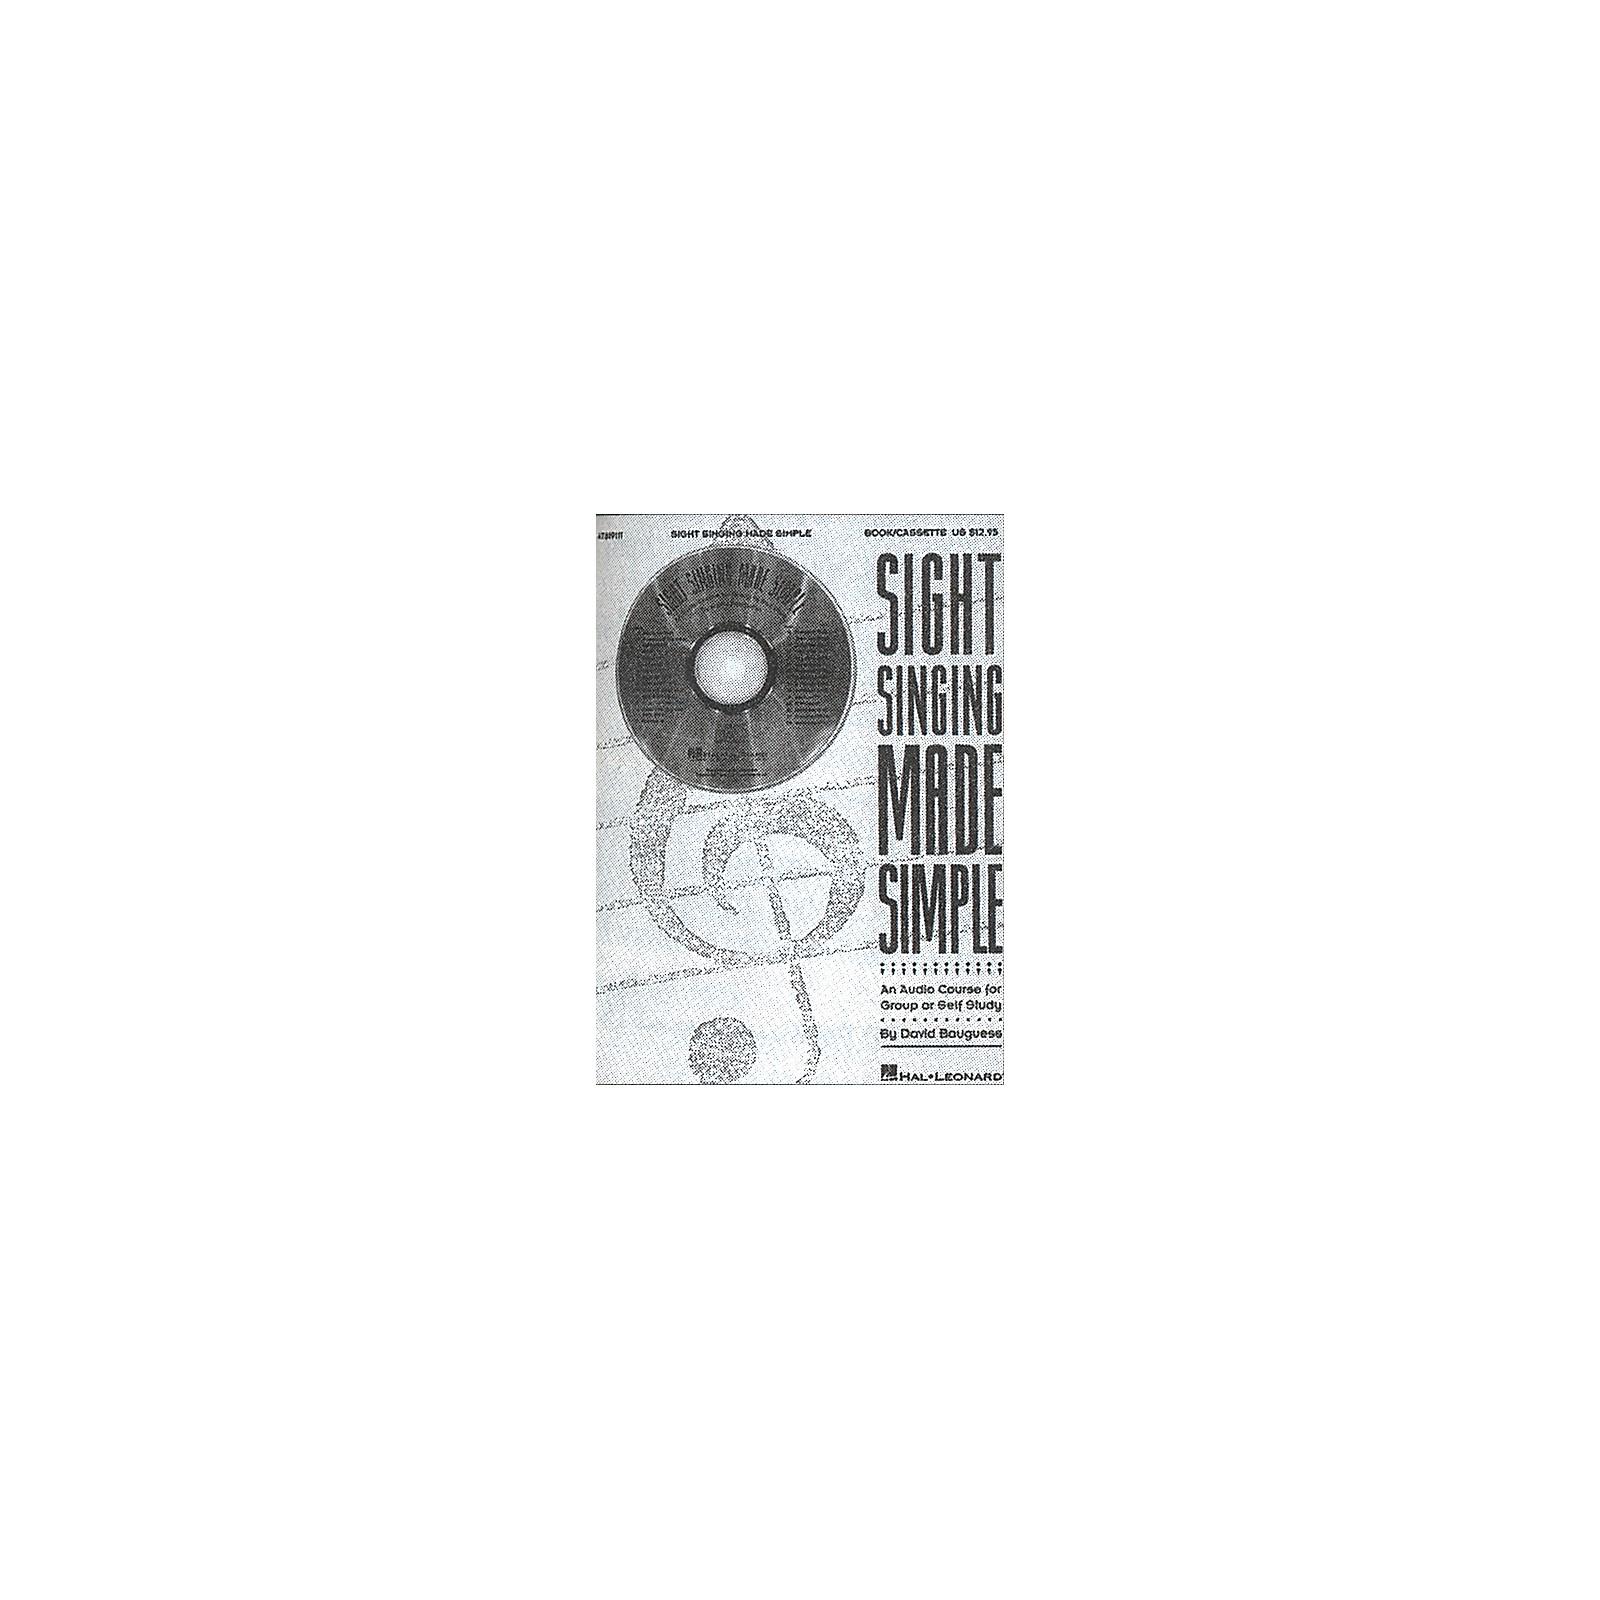 Hal Leonard Sight Singing CD Made Simple